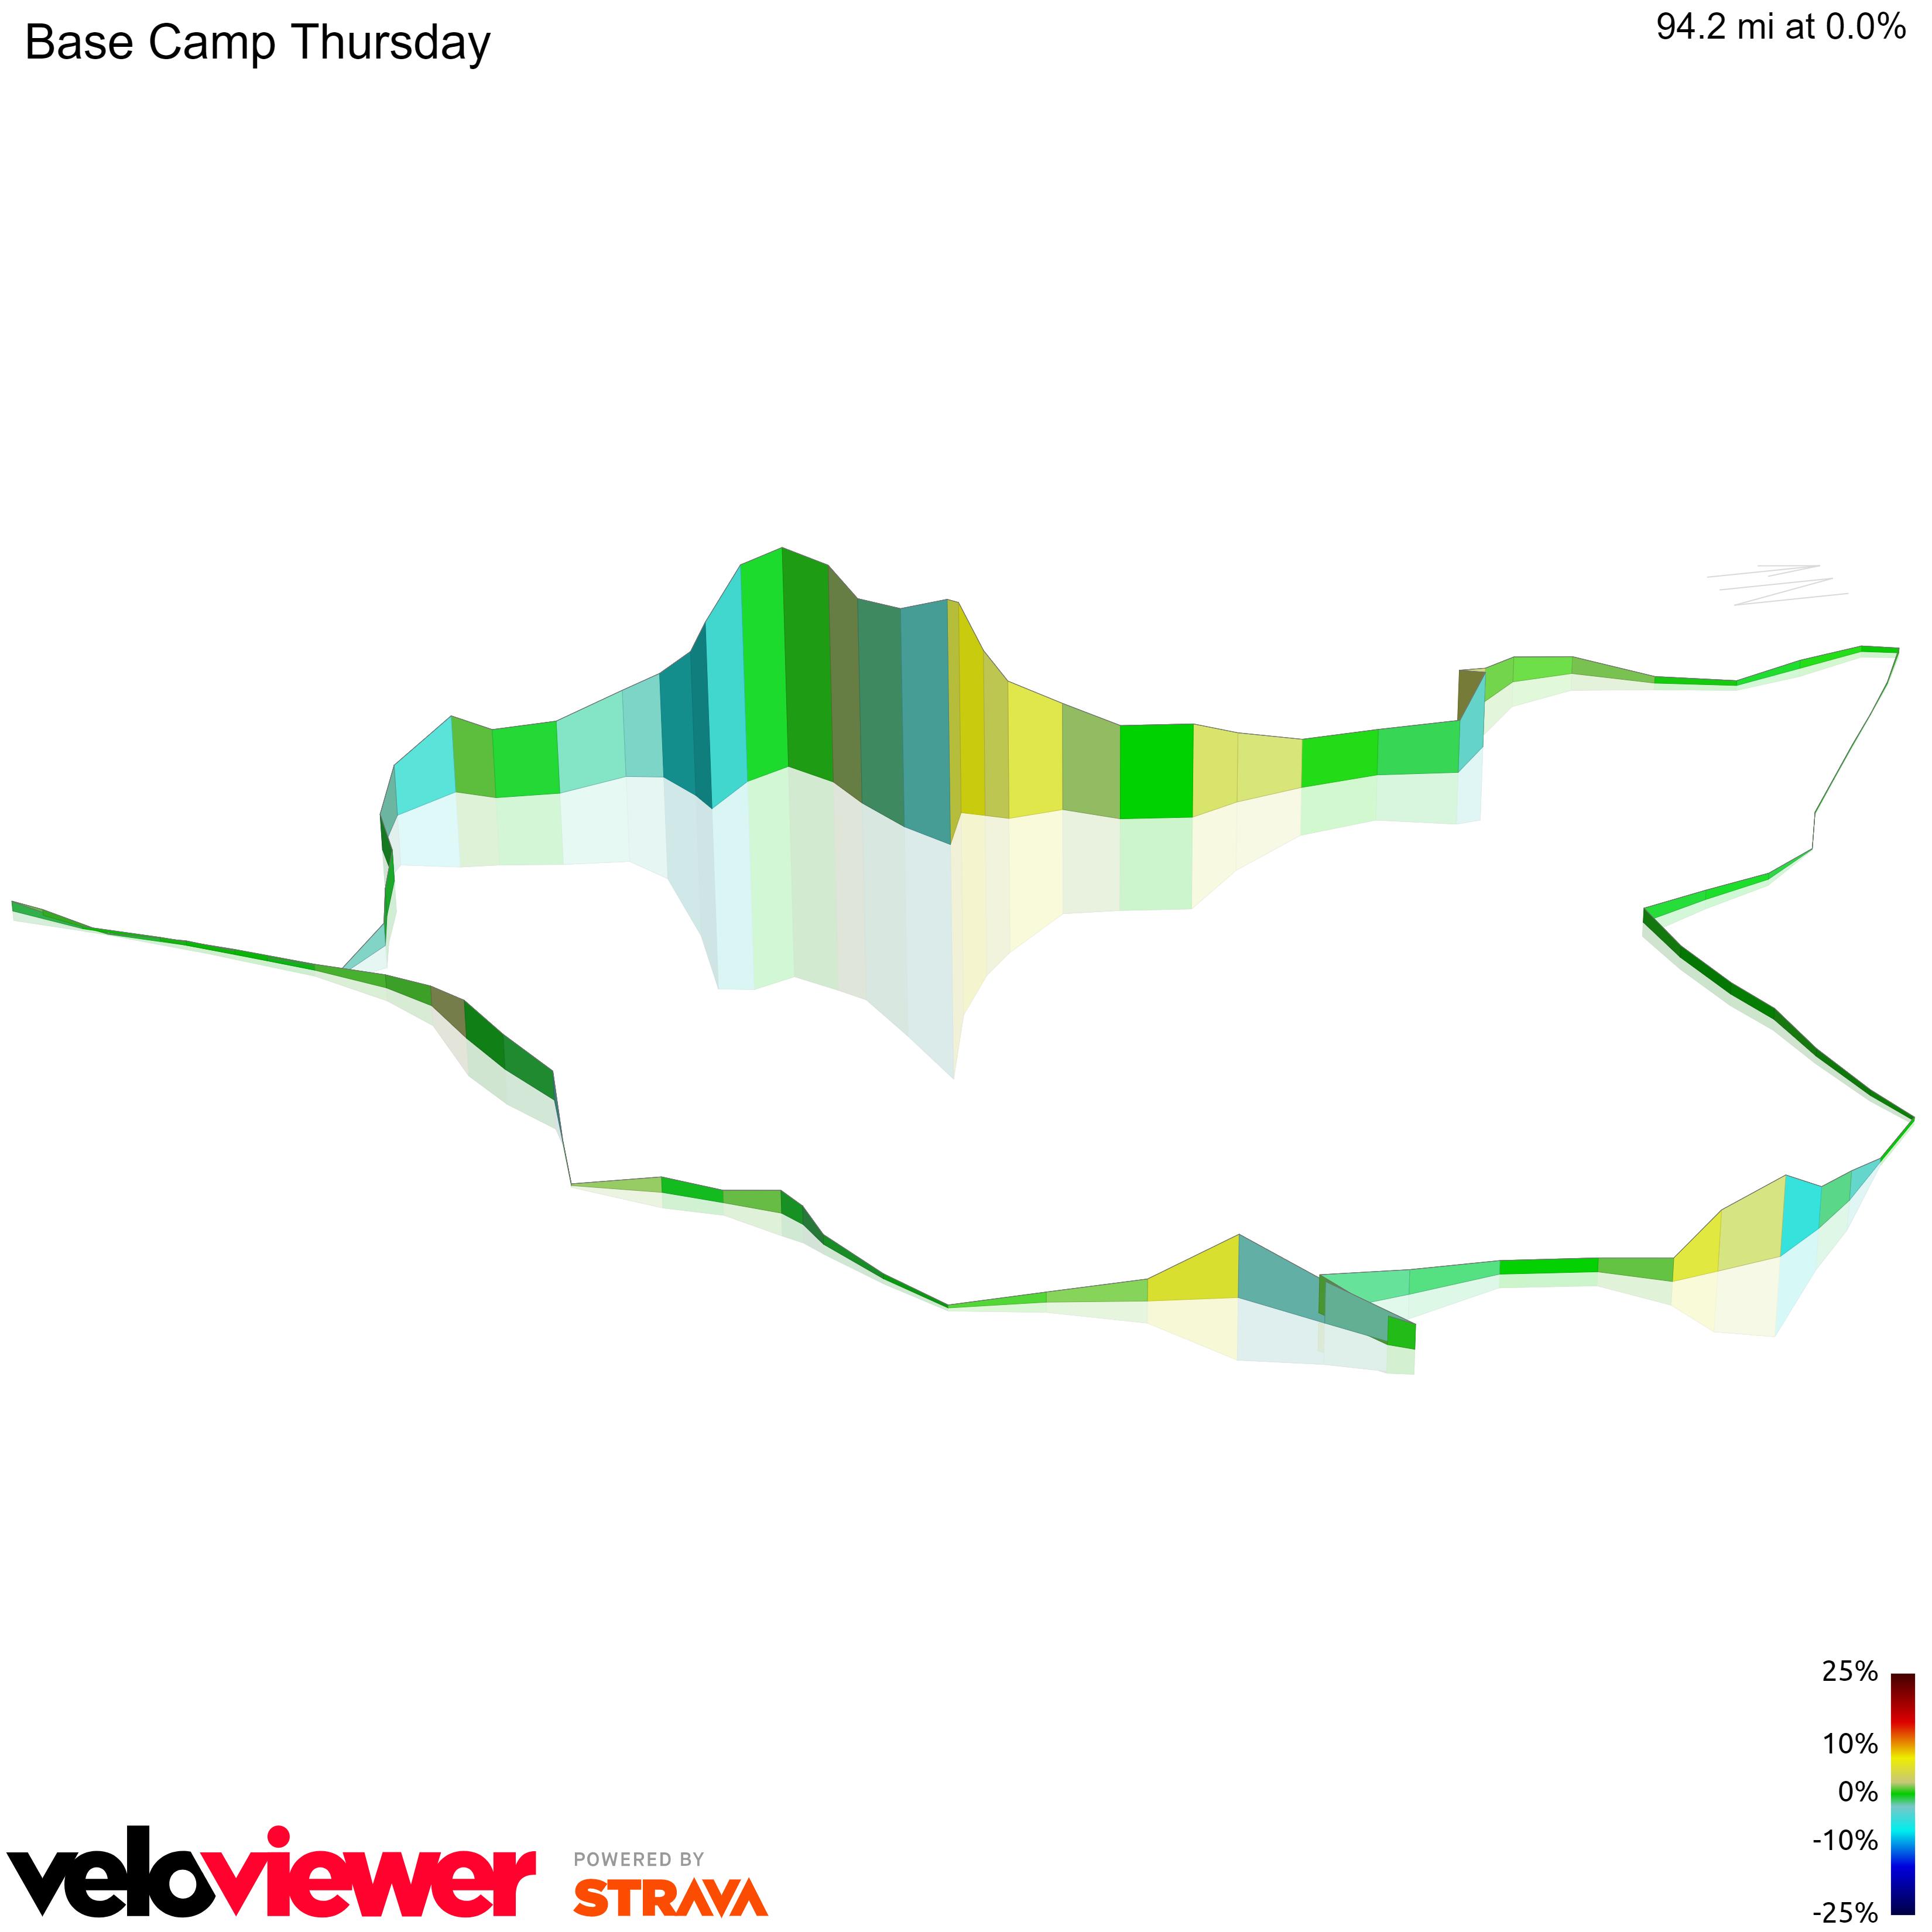 3D Elevation profile image for Base Camp Thursday